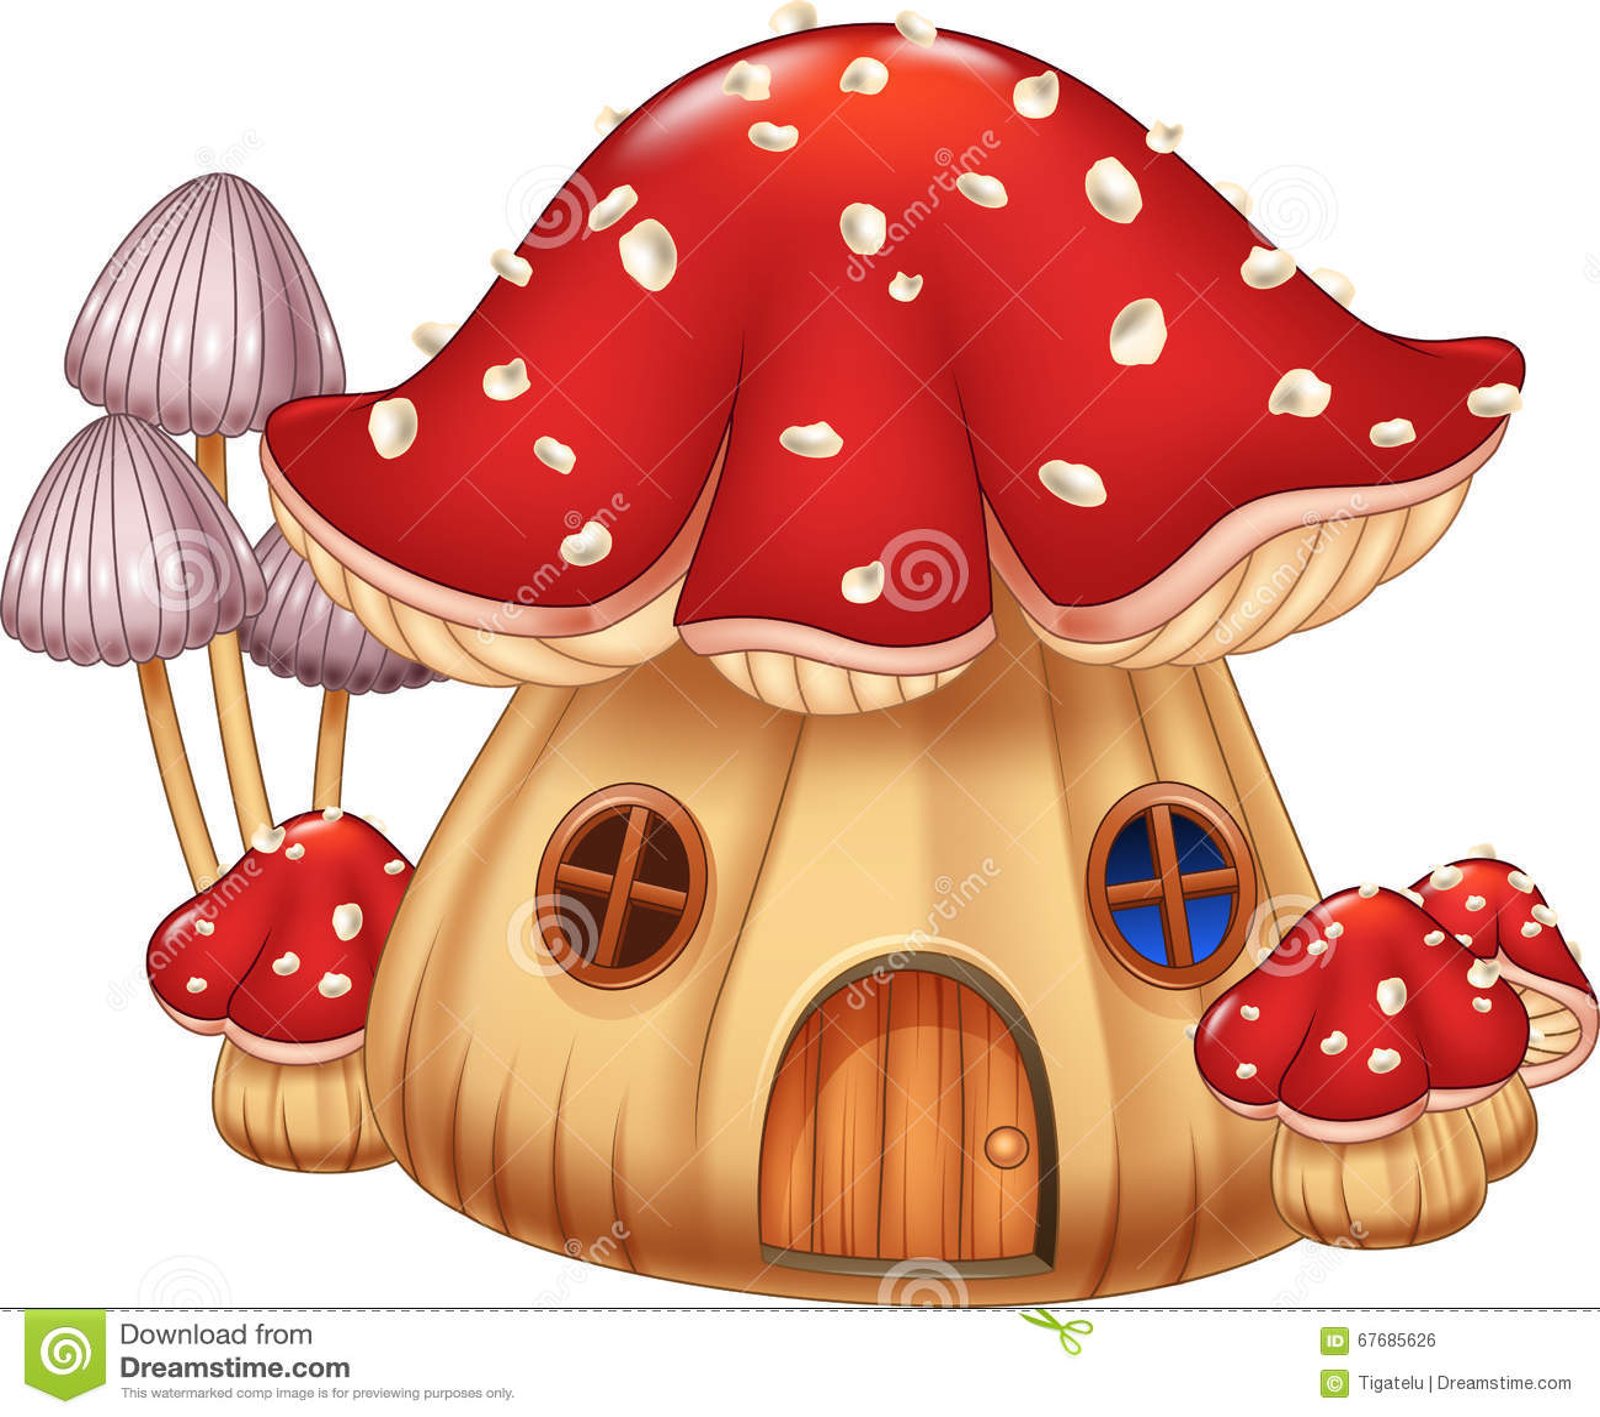 Download Cartoon Illustration Mushroom House Stock Vector - Illustration of vegetation, mushroom: 67685626